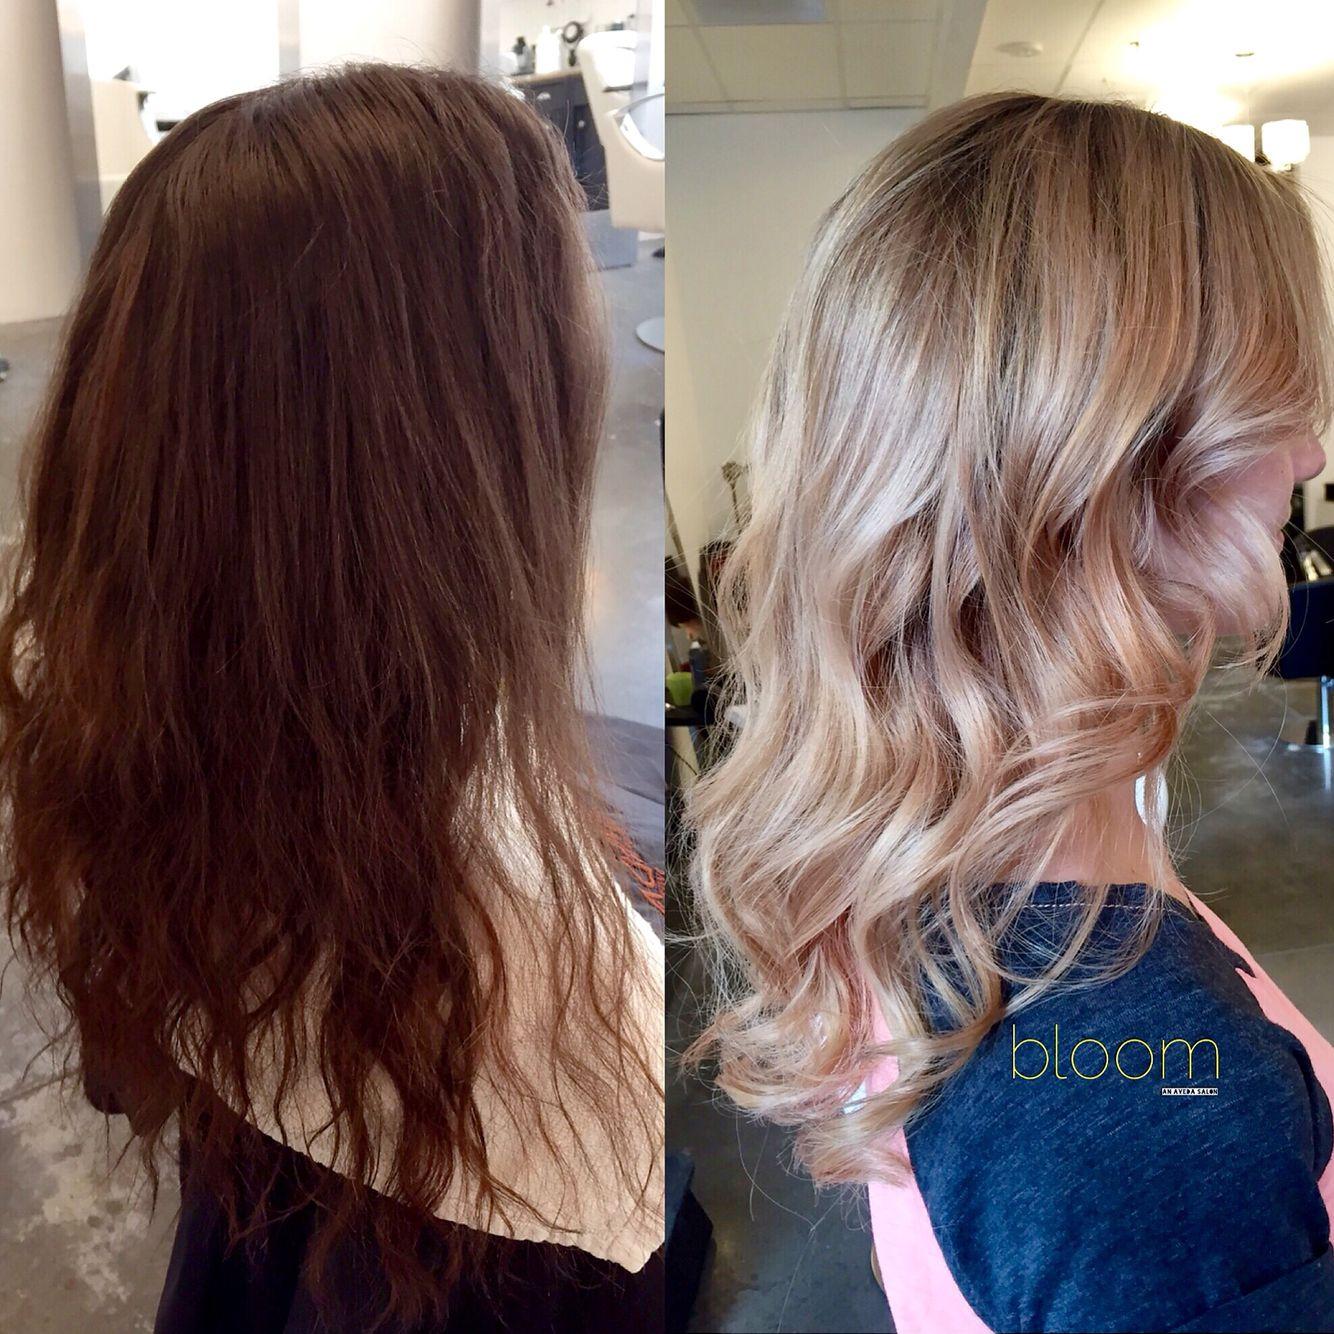 Dark Brown To Blonde In One Visit Using Balayage And Olaplex By Bloom Stylist Samantha Bleach Brown Hair Brown Blonde Hair Hair Makeover